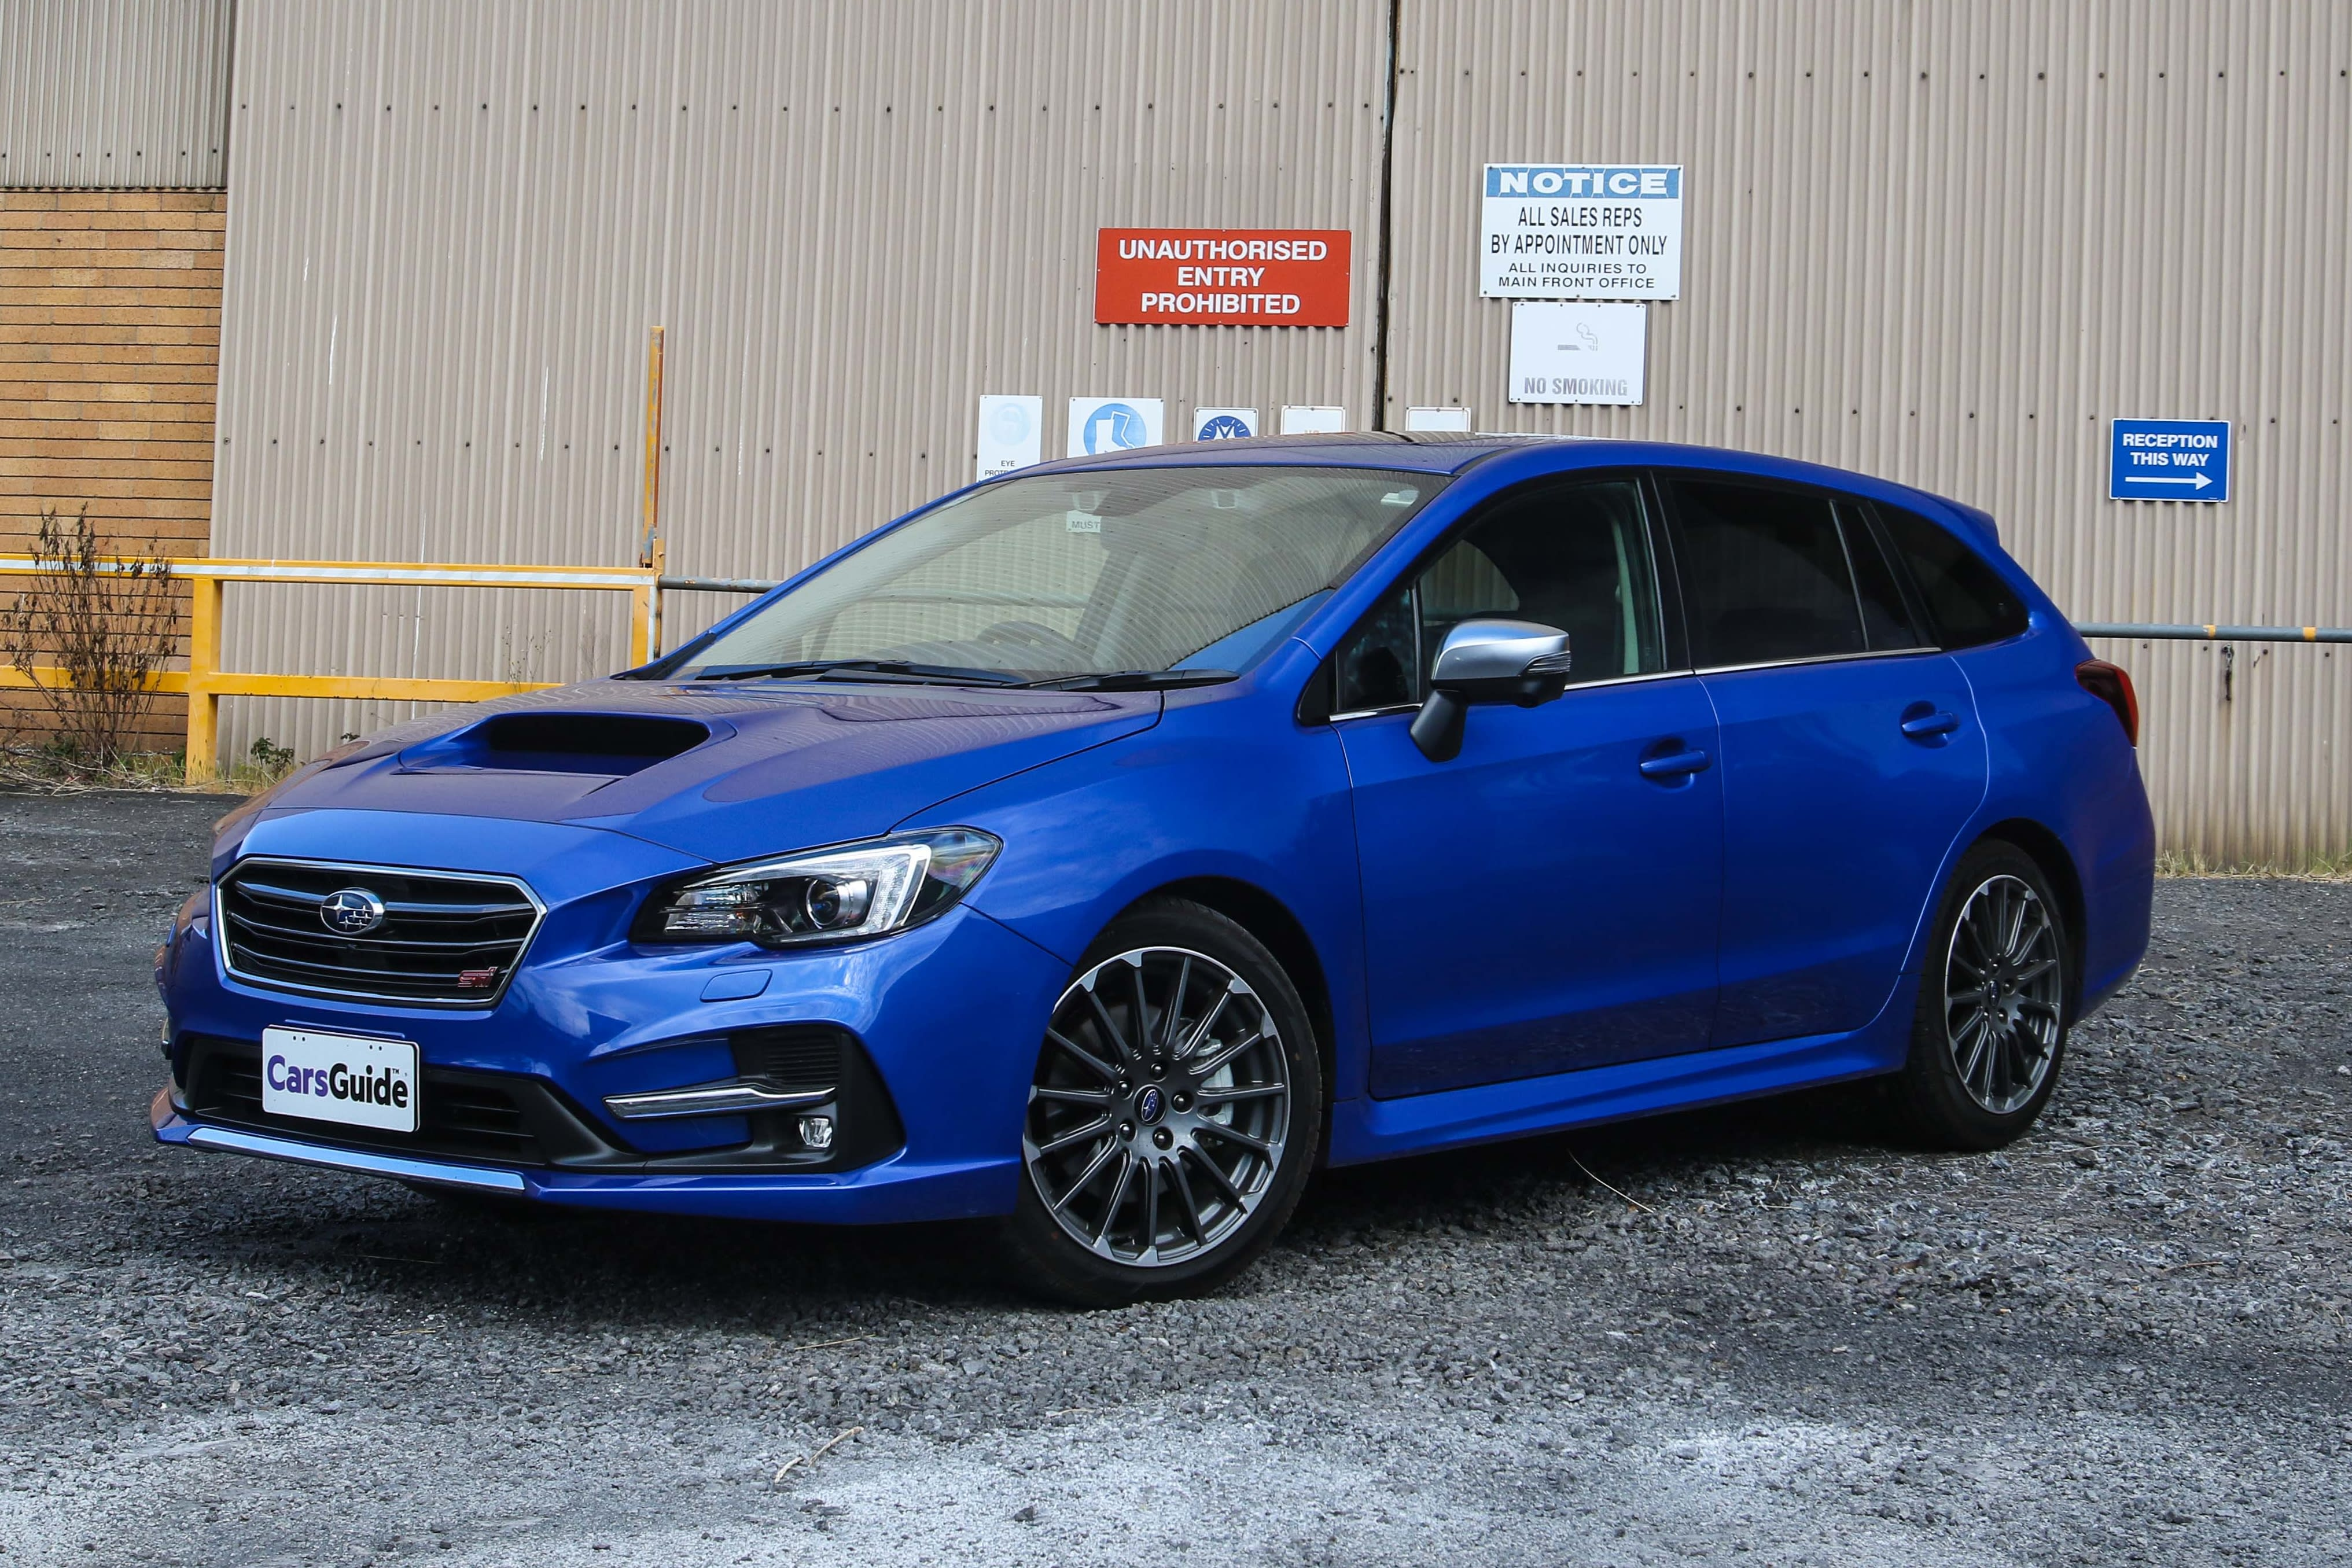 2018 Subaru Impreza Sport Hatchback >> Subaru Levorg 2018 review | CarsGuide